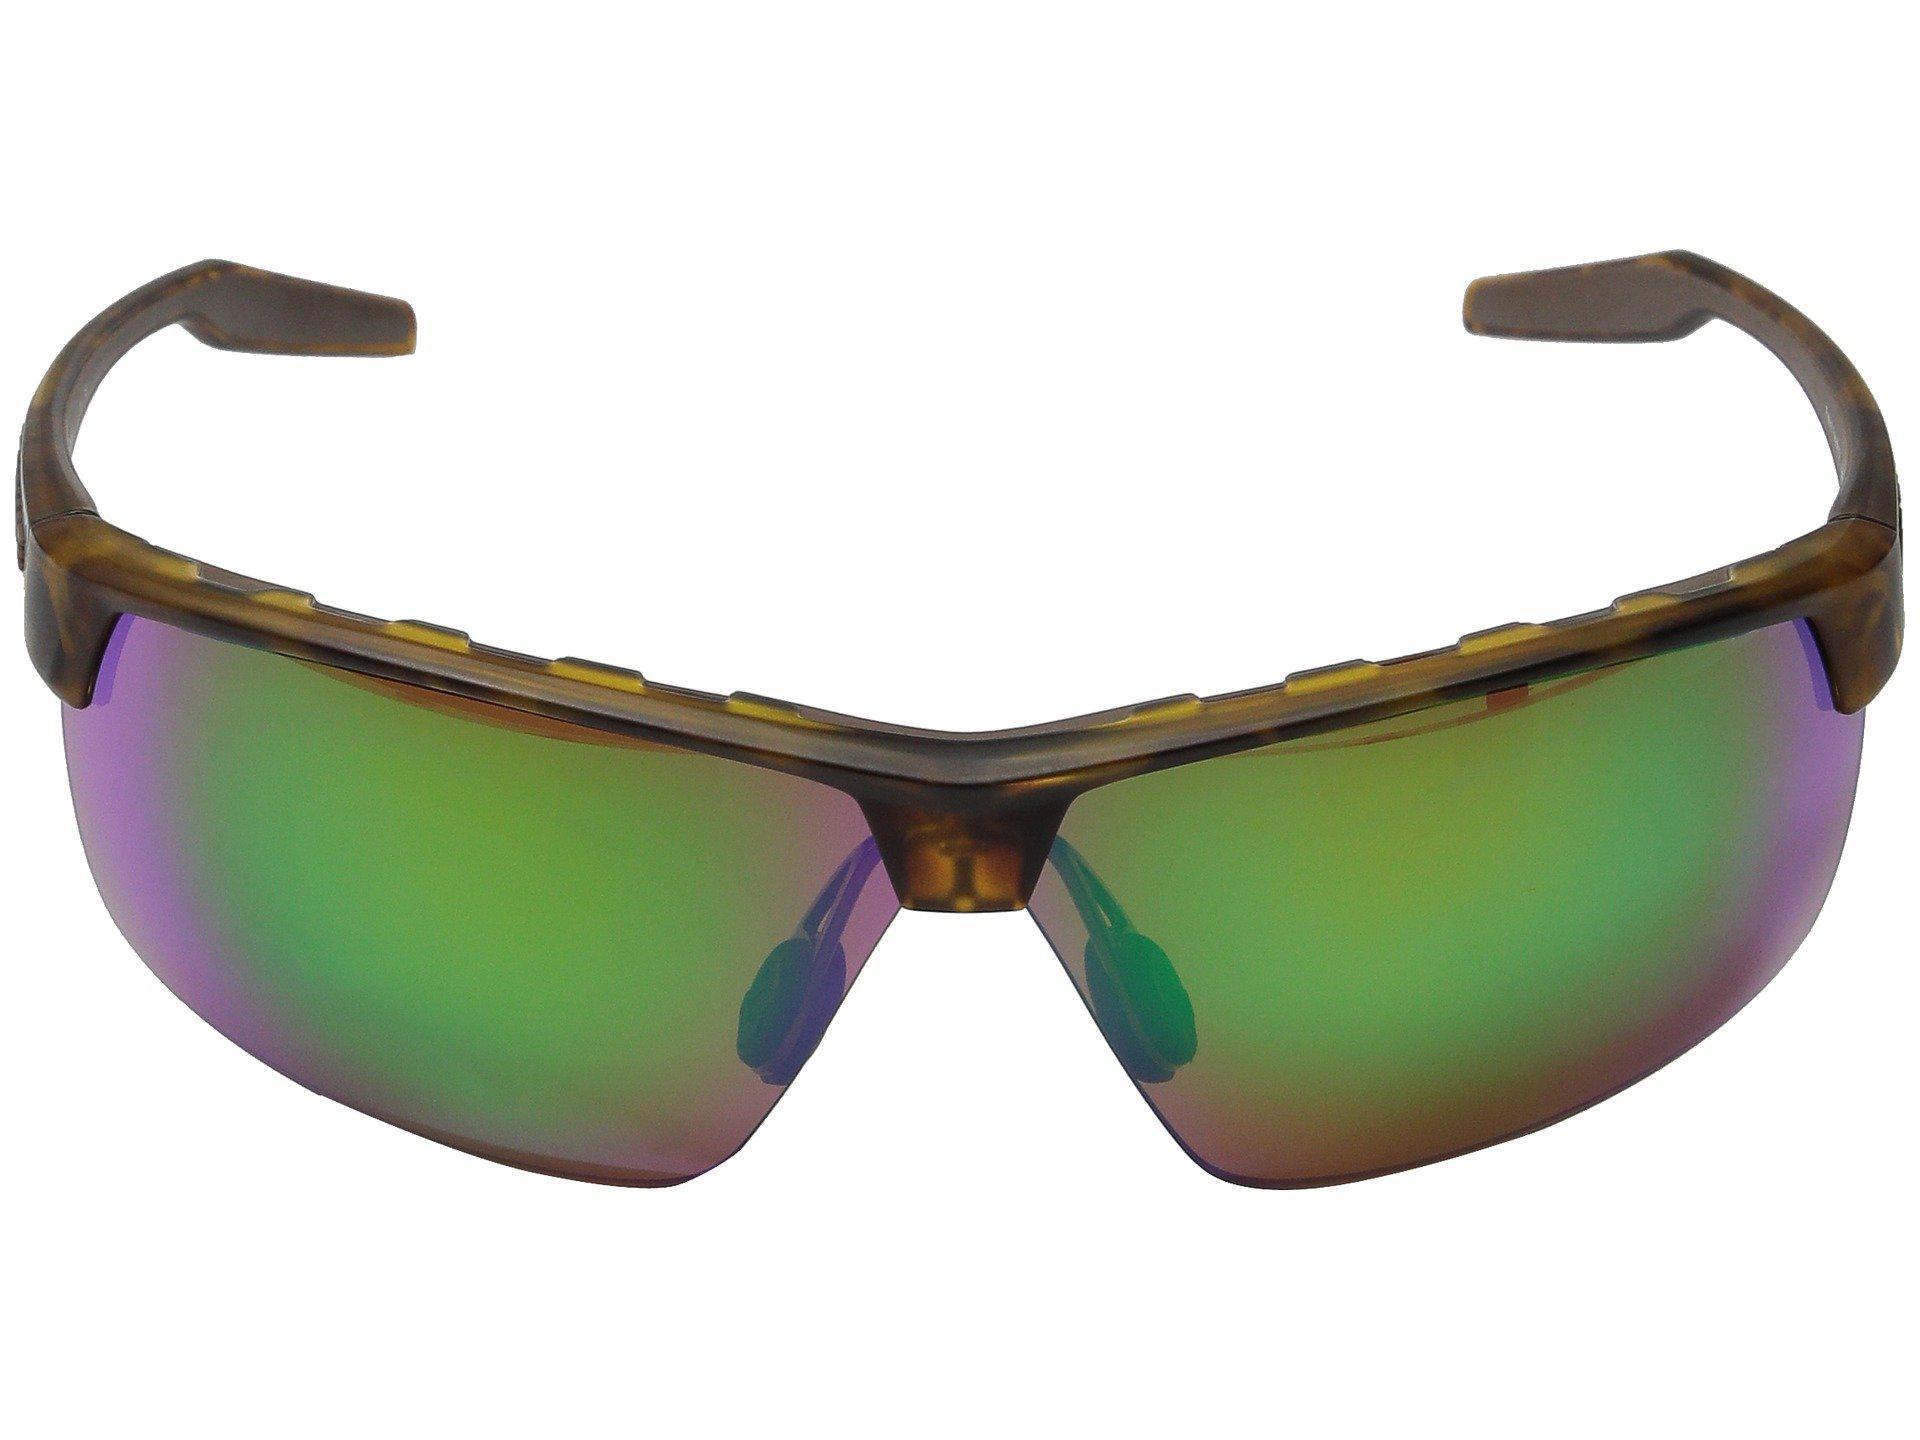 32cd22de702 Native Eyewear - Brown Hardtop Ultra Xp (granite blue Reflex) Sport  Sunglasses for. View fullscreen